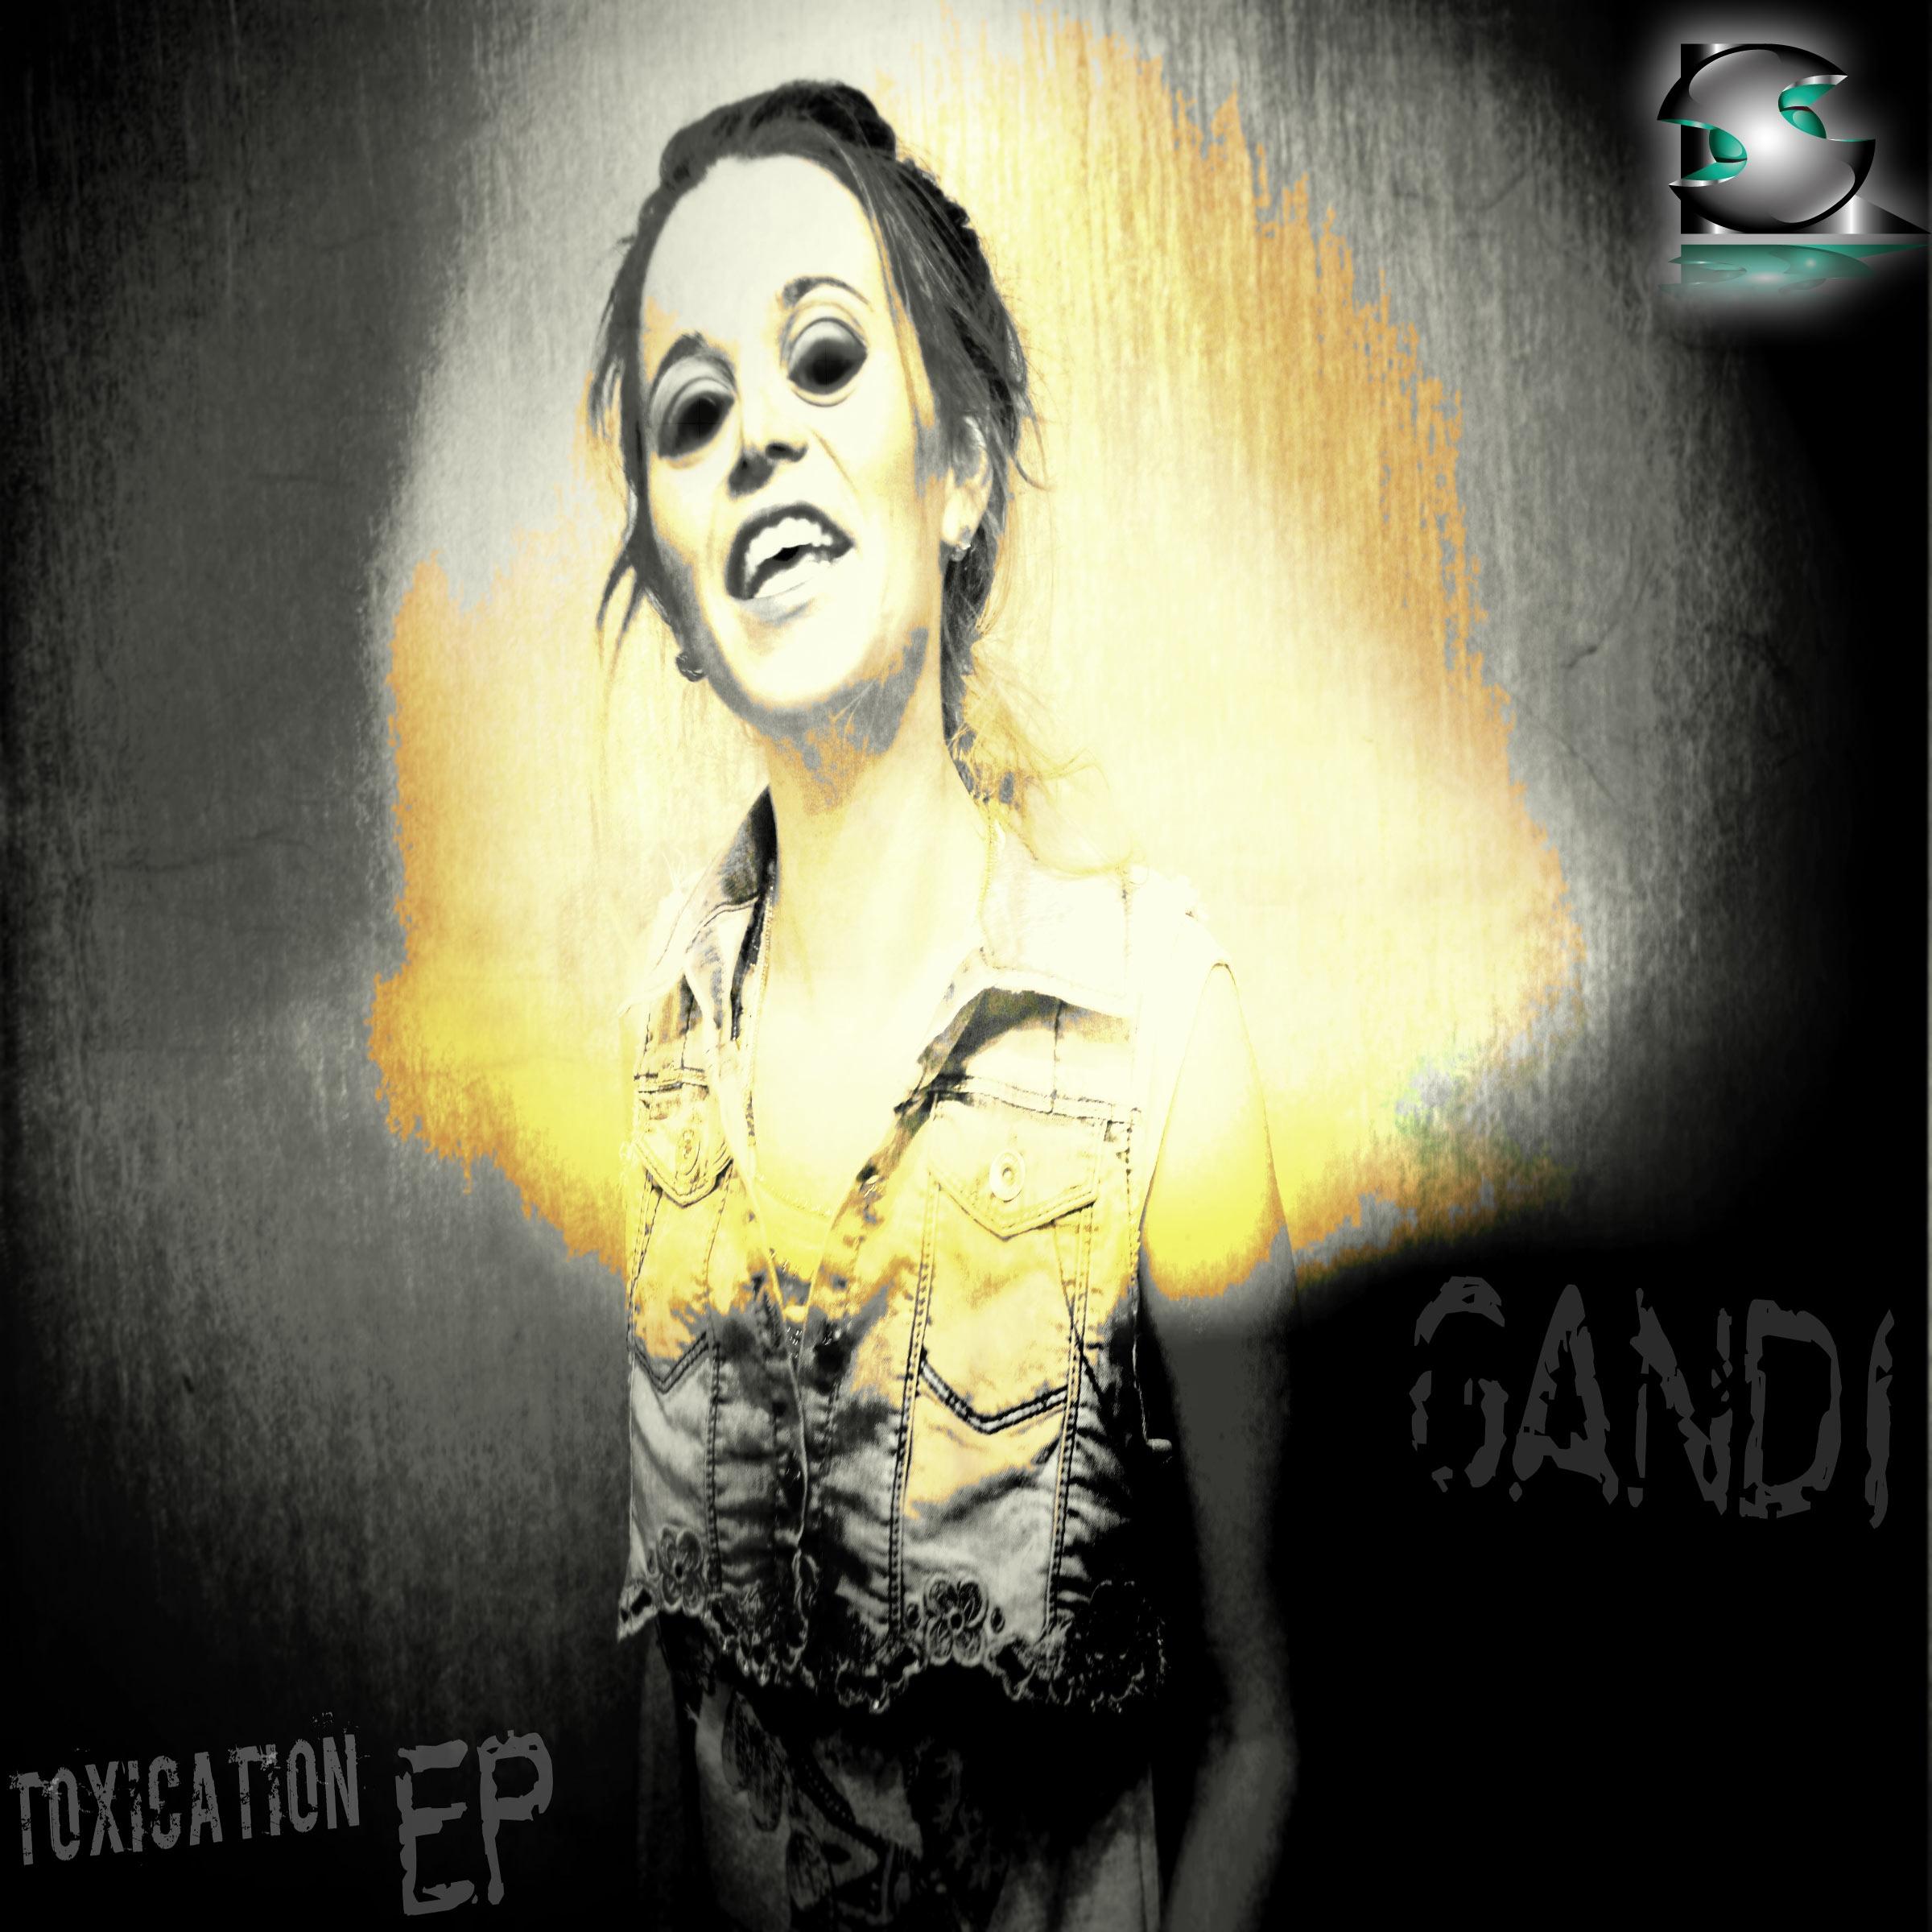 GANDI - Manipulator (Original mix)